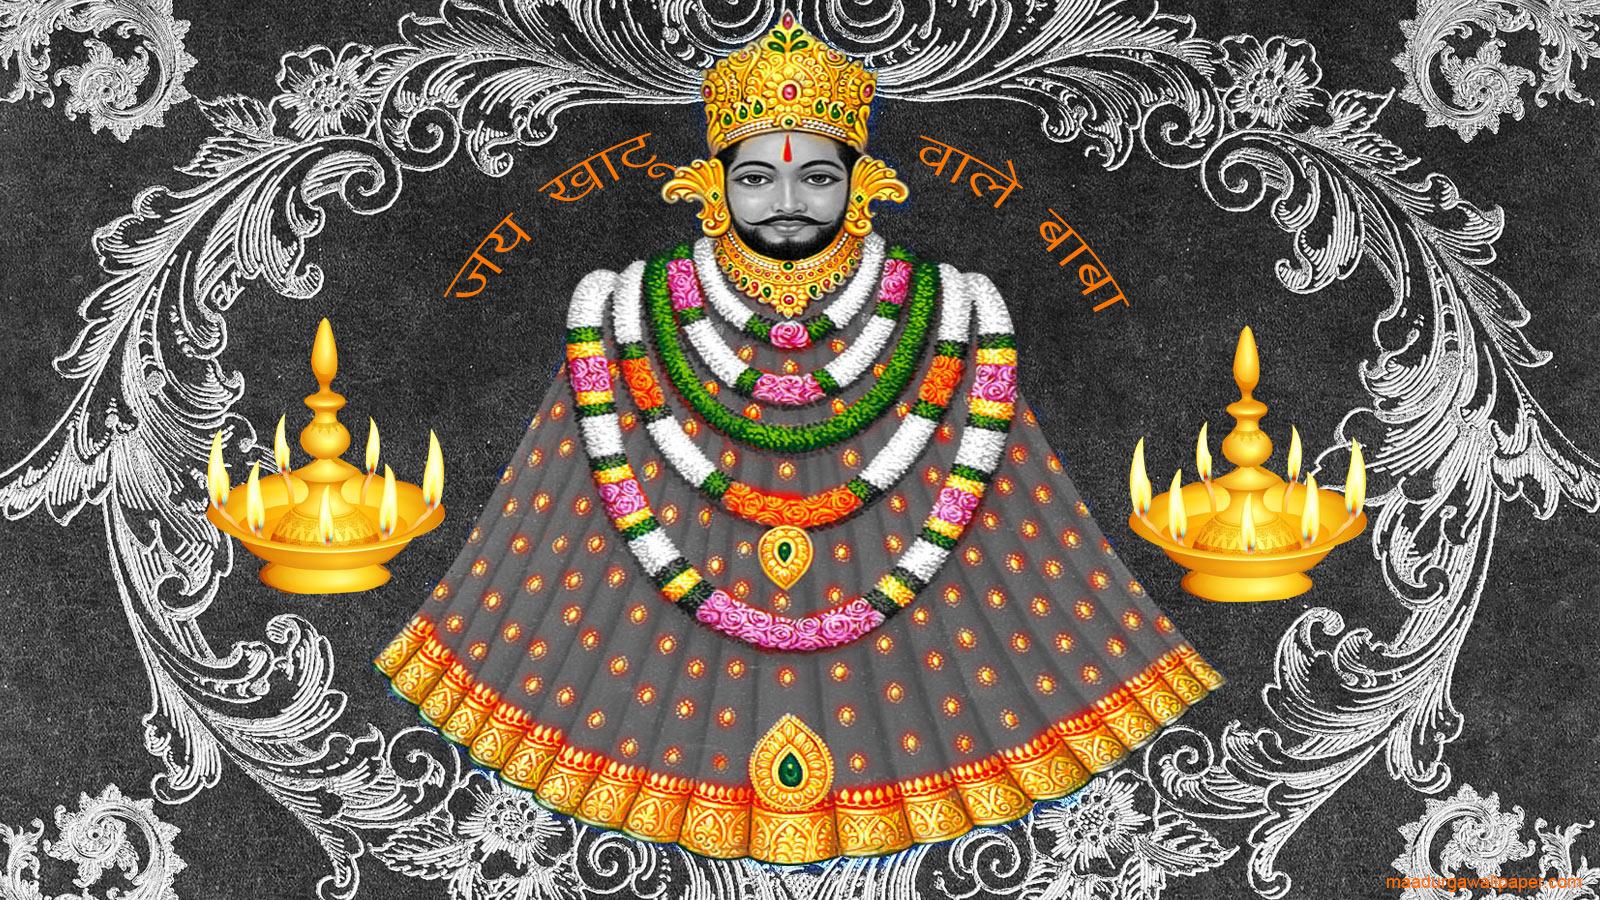 Khatu Shyam Baba Wallpaper Khatu Shyam Baba 1600x900 Download Hd Wallpaper Wallpapertip